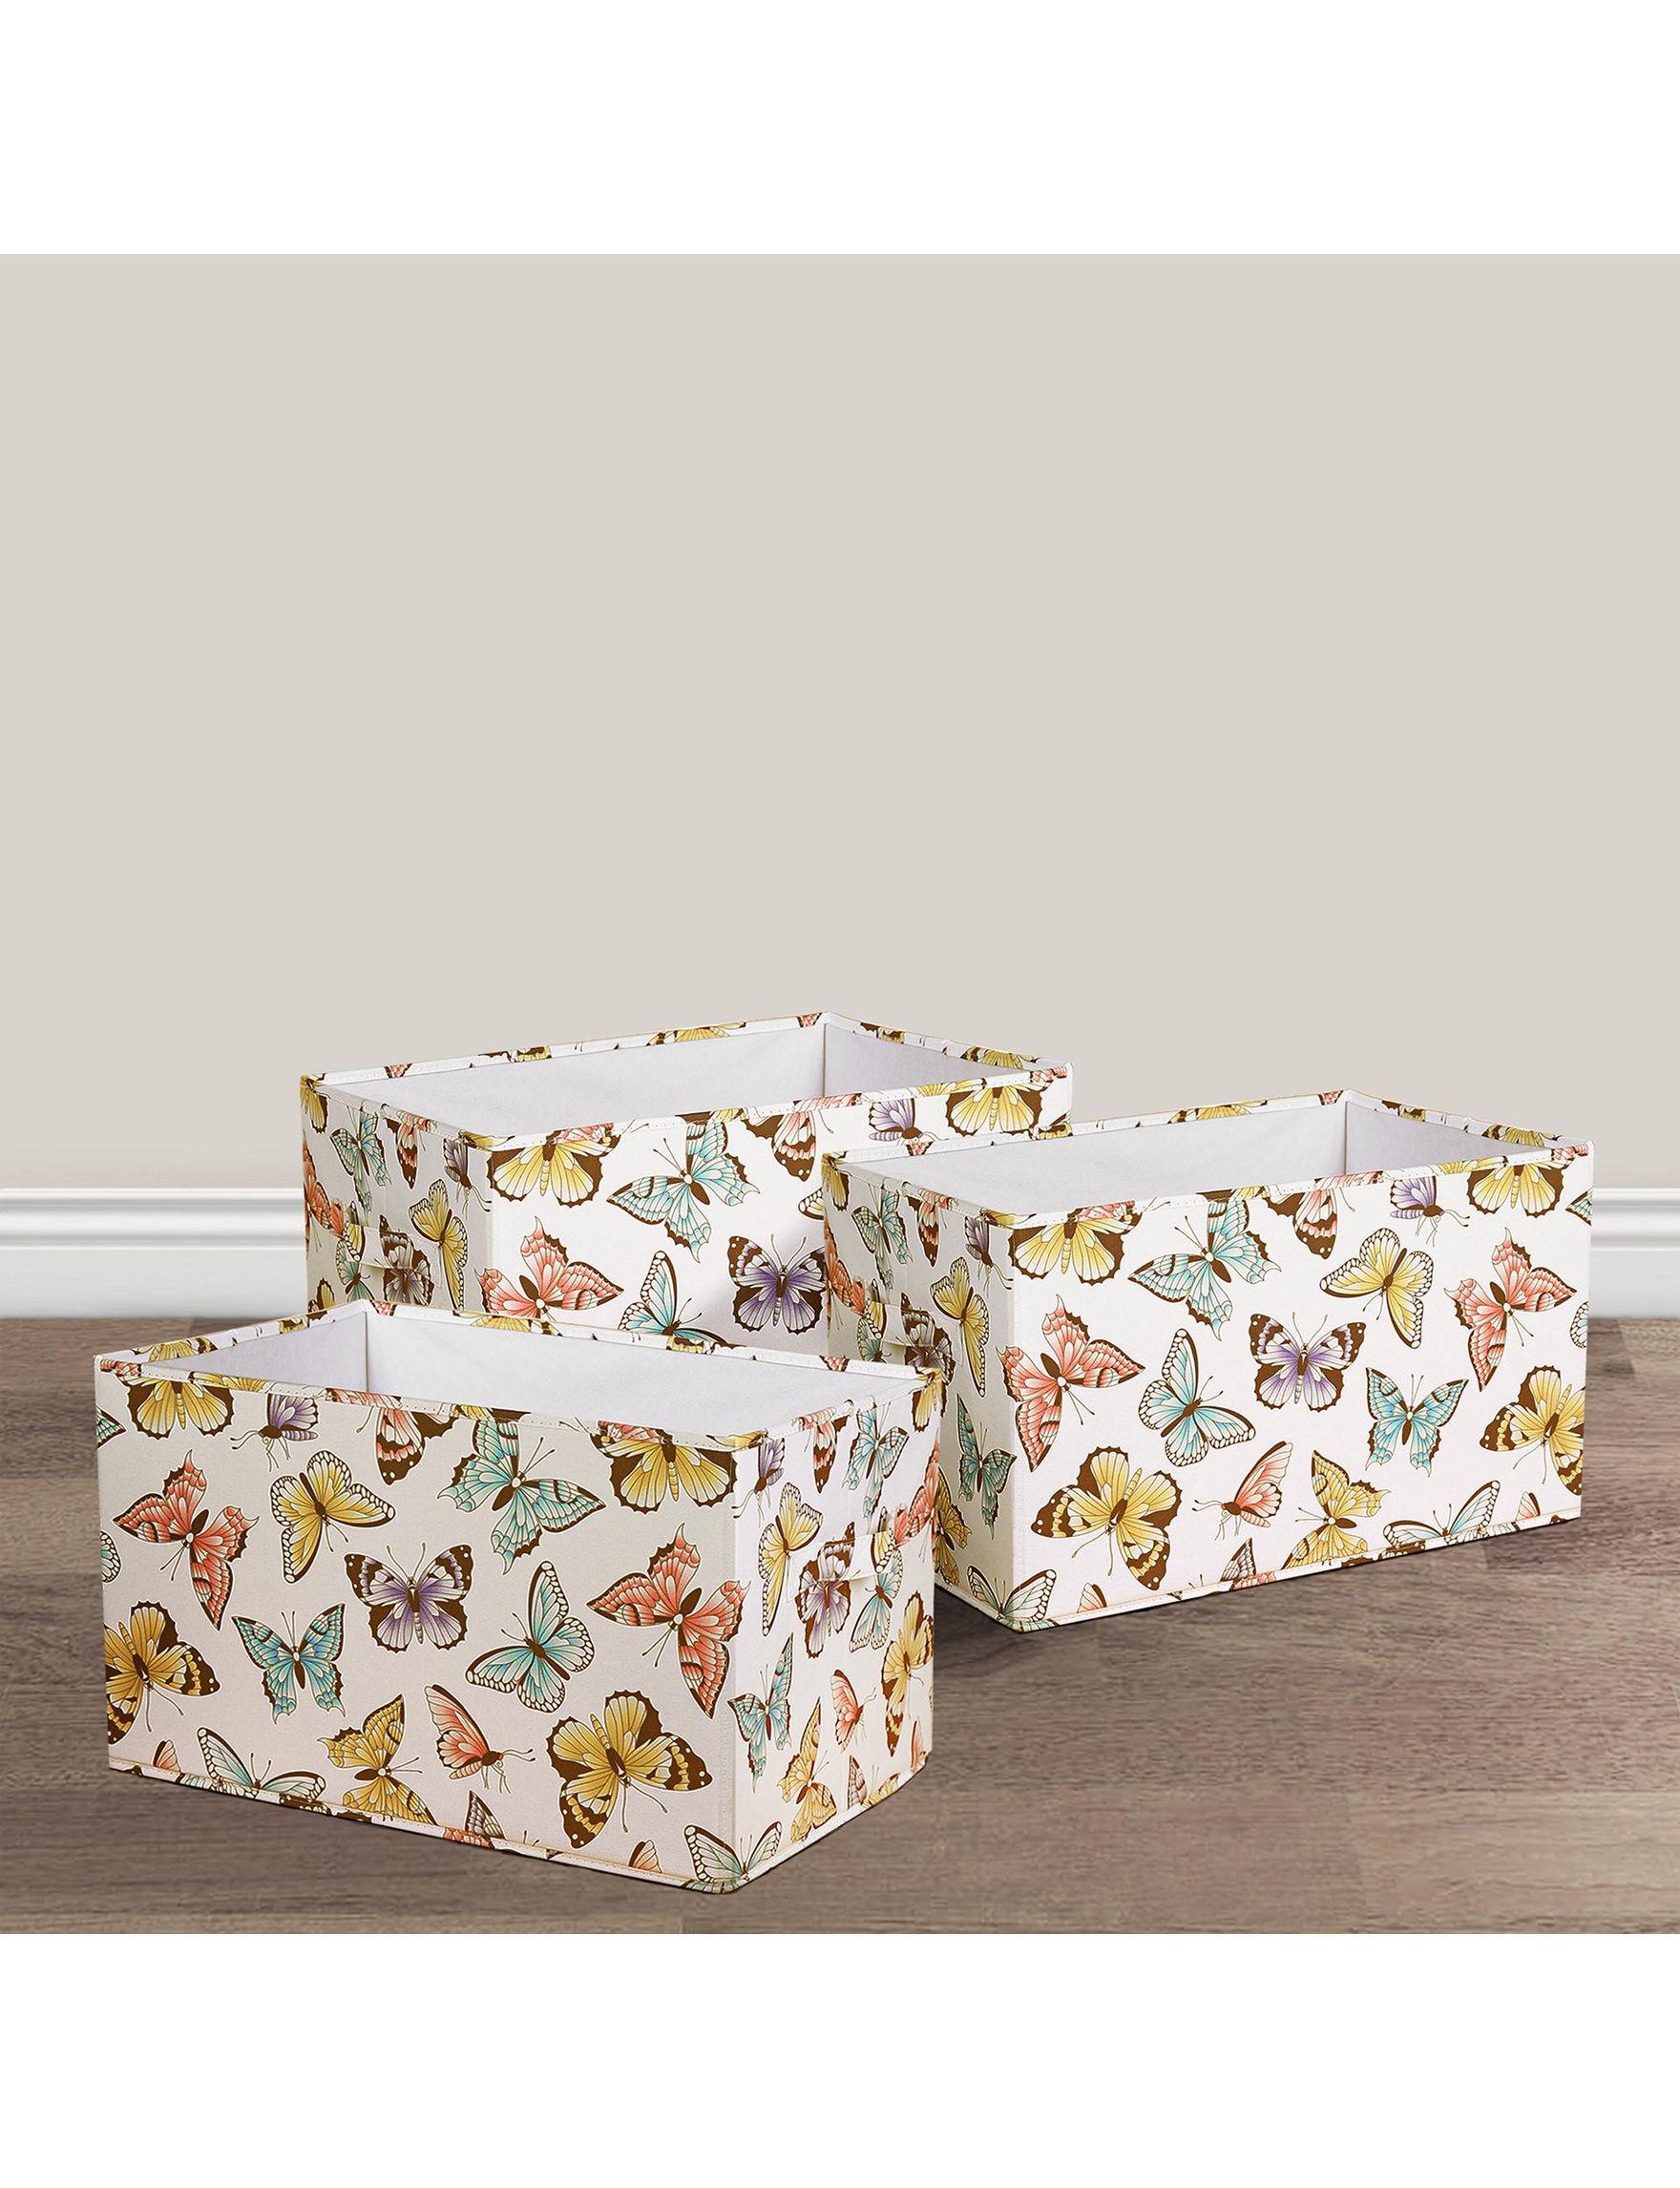 Lush Decor White / Multi Storage Bags & Boxes Storage & Organization